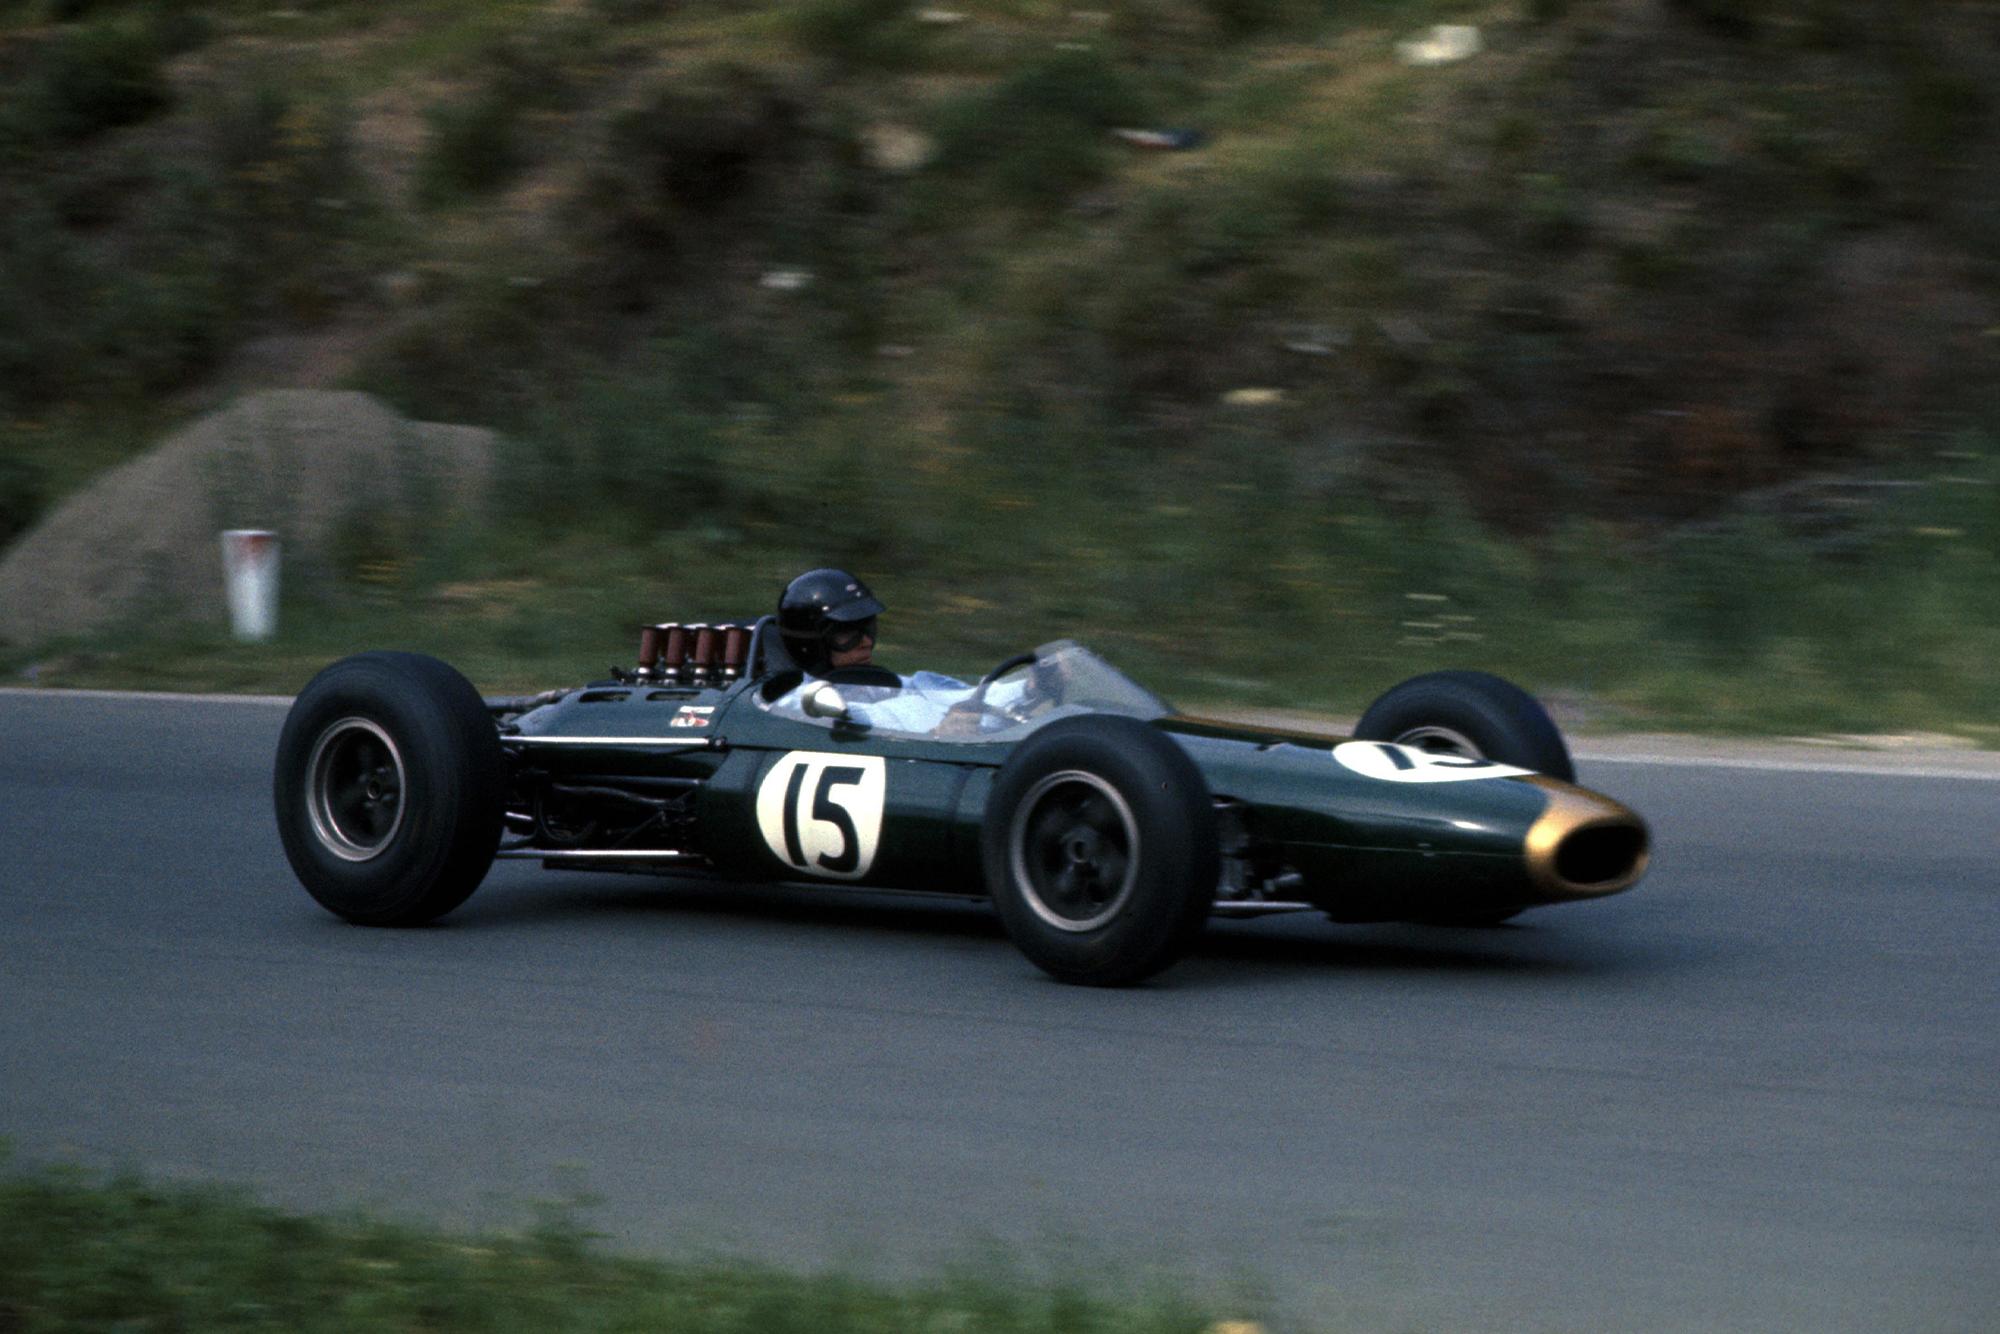 Dan Gurney in his Brabham.